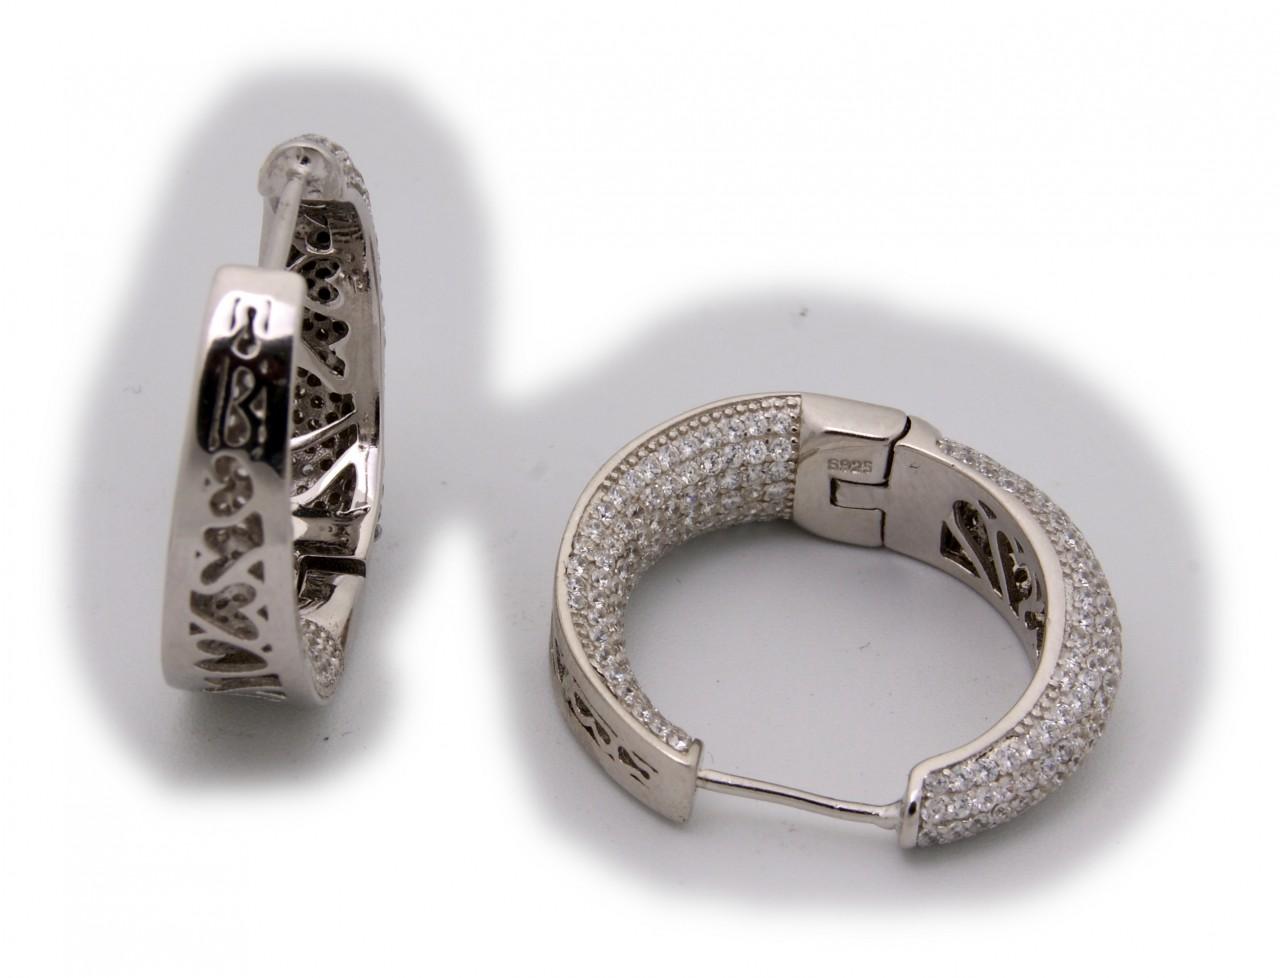 schöne Damen Ohrringe Klapp Creolen echt Silber 925 Sterlingsilber Zirkonia Neu